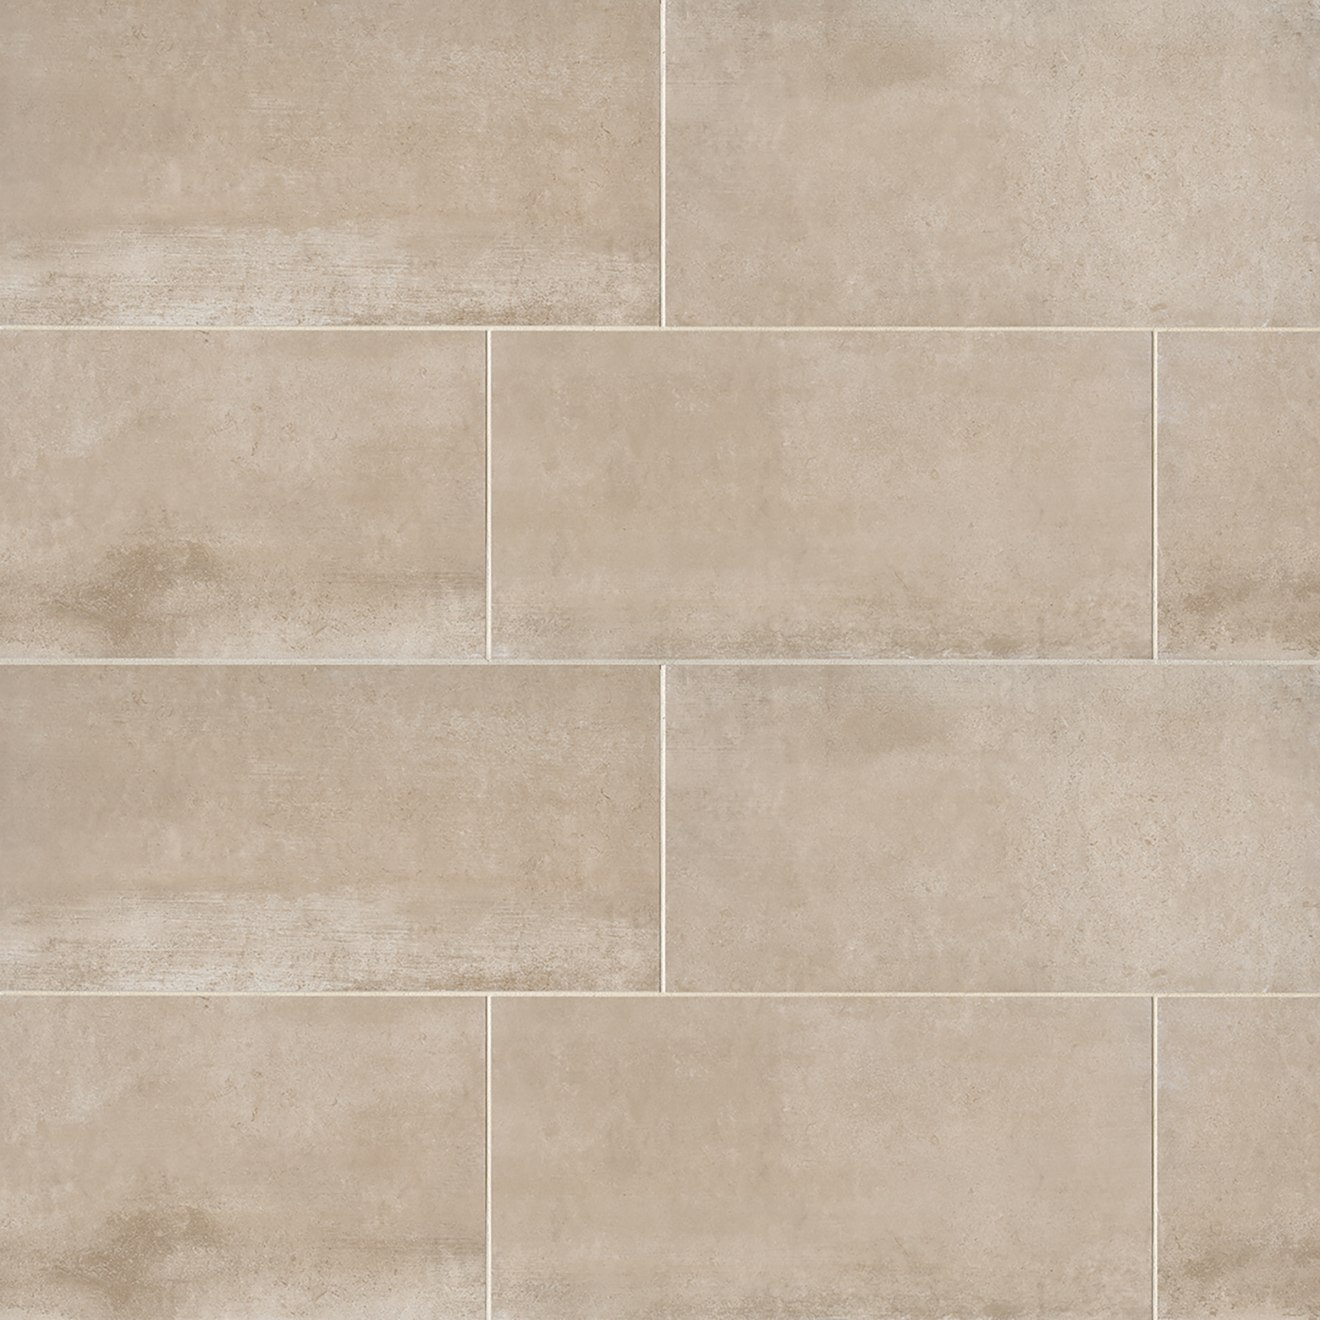 Clive 24 X 48 Floor Wall Tile In Beige Bedrosians Tile Stone